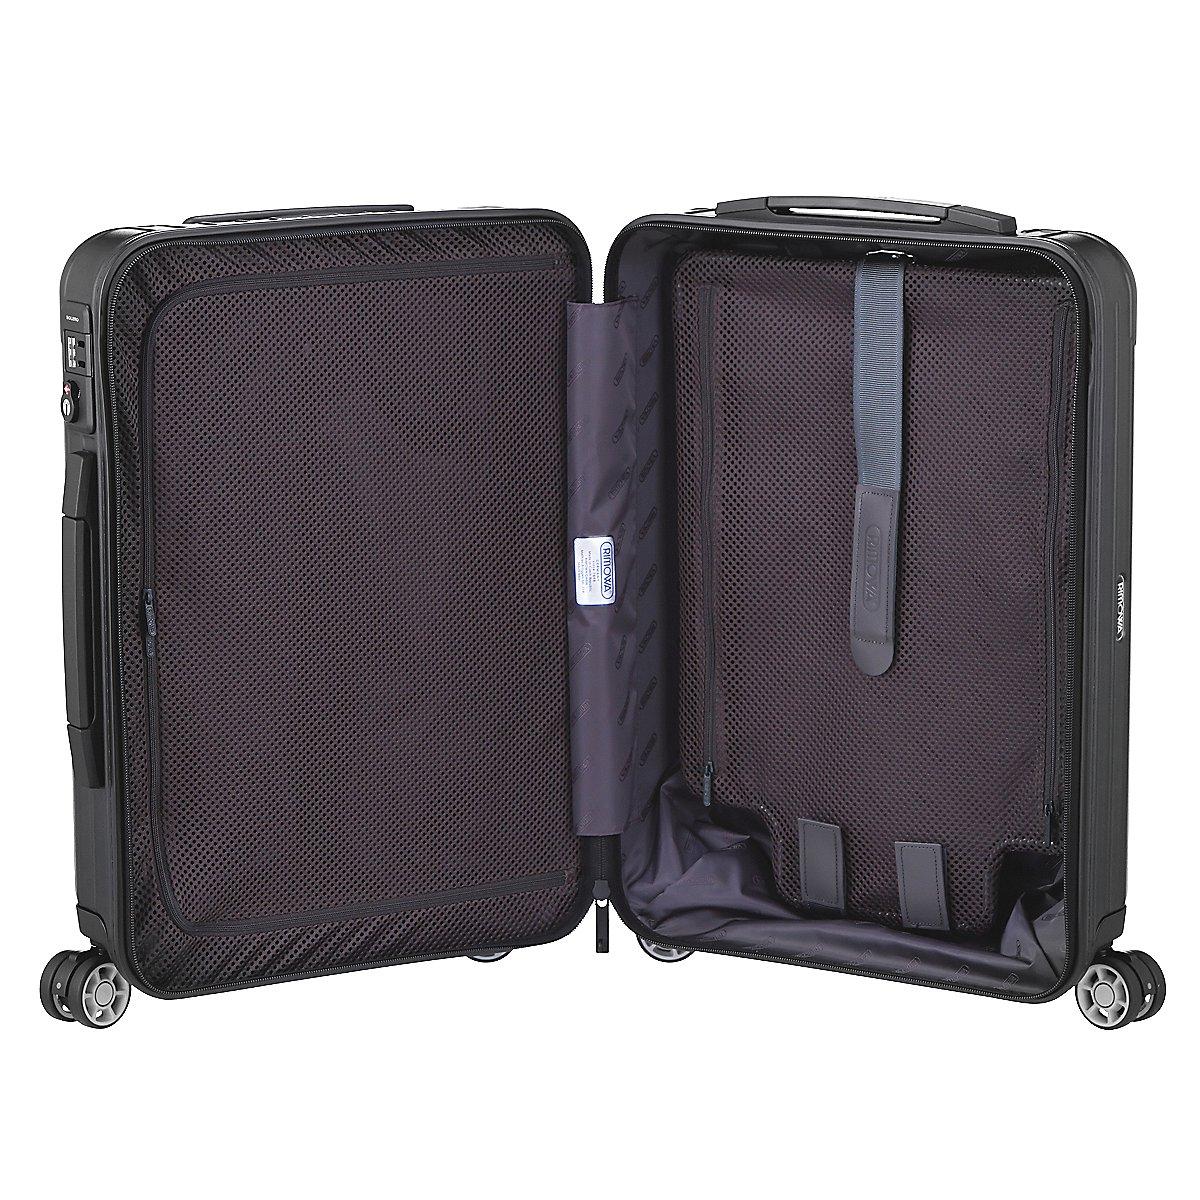 rimowa bolero multiwheel cabin trolley 55 cm koffer. Black Bedroom Furniture Sets. Home Design Ideas